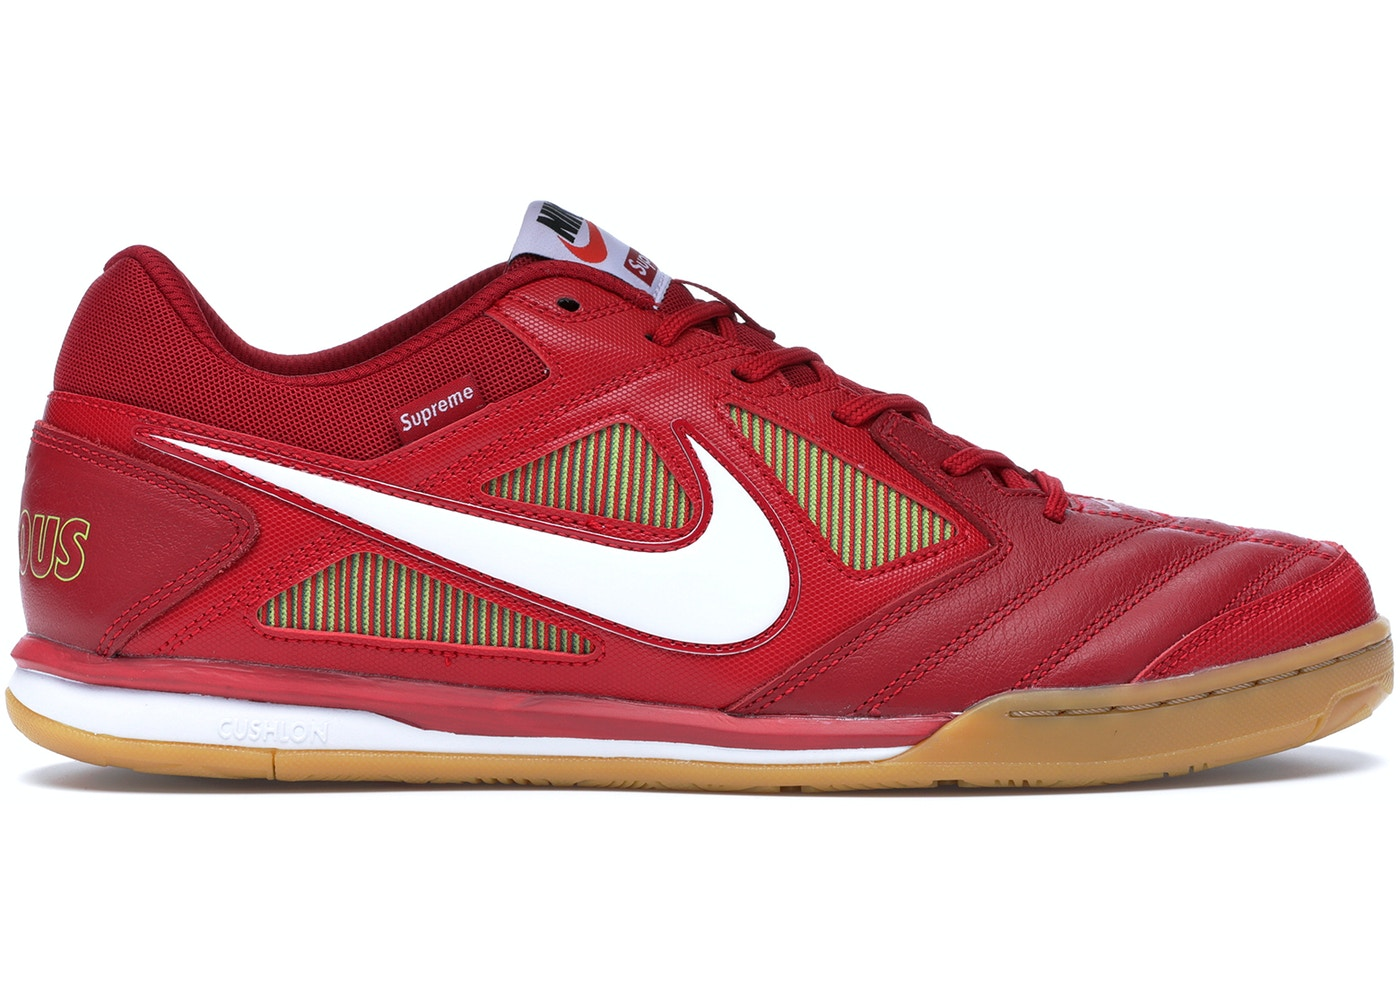 online retailer c966c 18fbe Nike SB Gato Supreme Red - AR9821-600